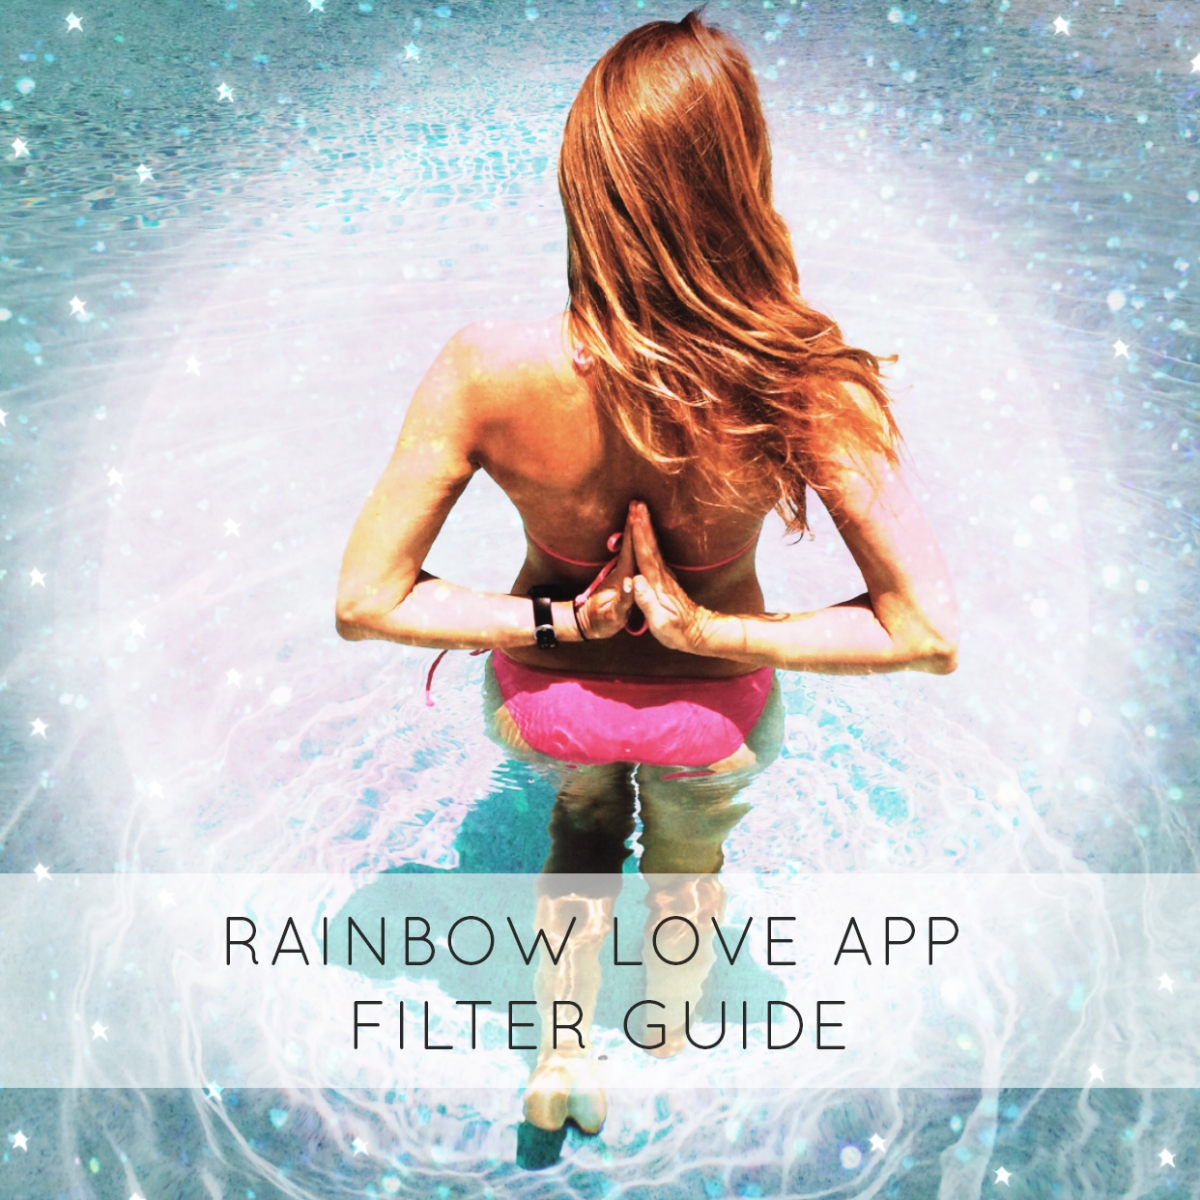 rainbow-love-app-photo-filter-guide